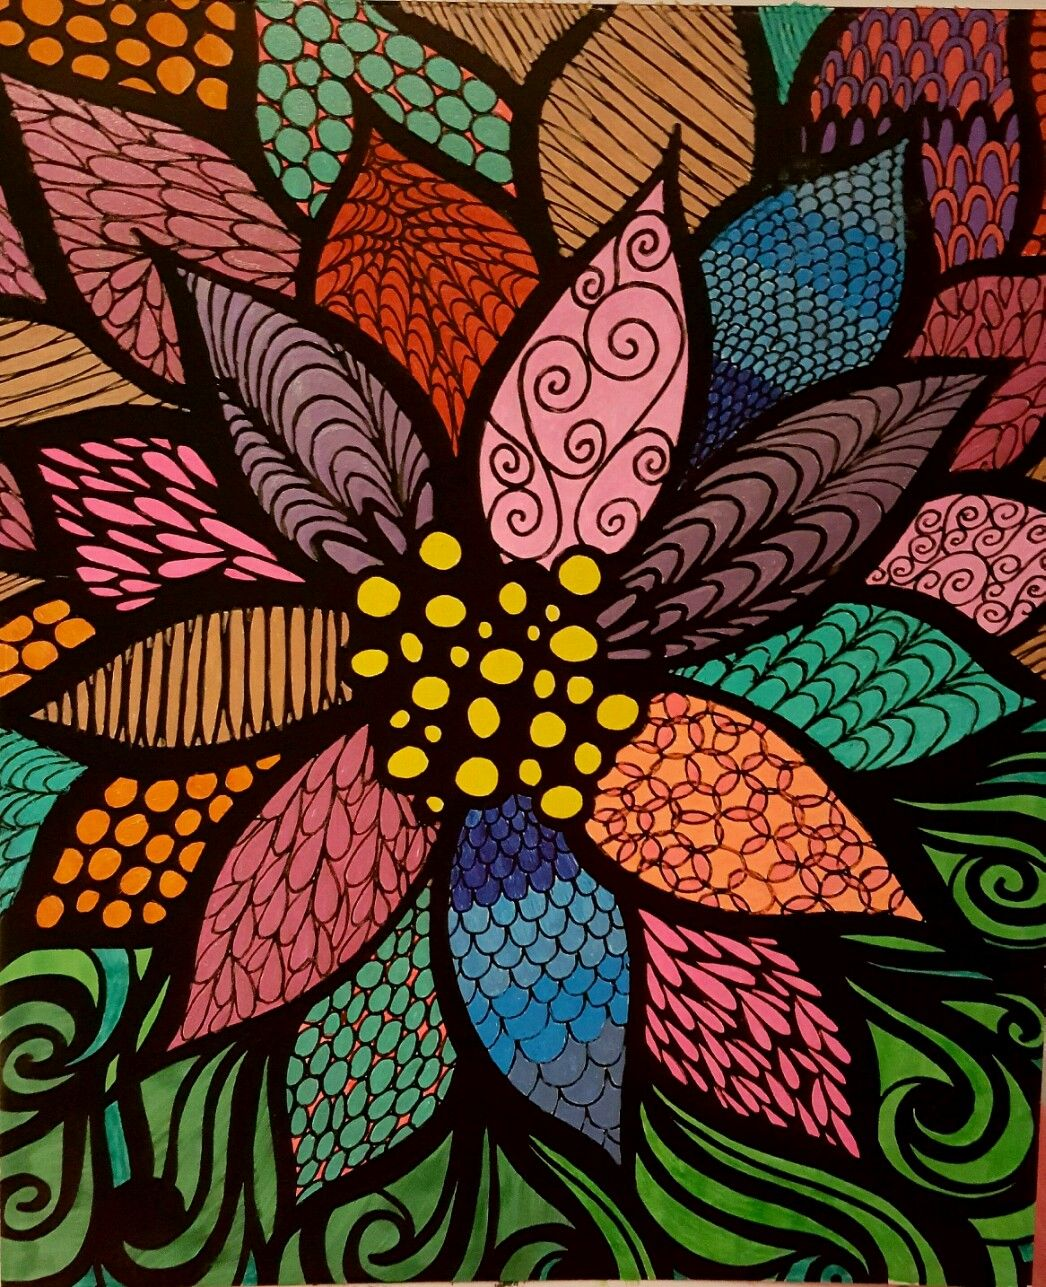 ColorIt Colorful Flowers Volume 1 Colorist Diane Cole Adultcoloring Coloringforadults Adultcoloringpages DianeAdult ColoringColoring BookColorful